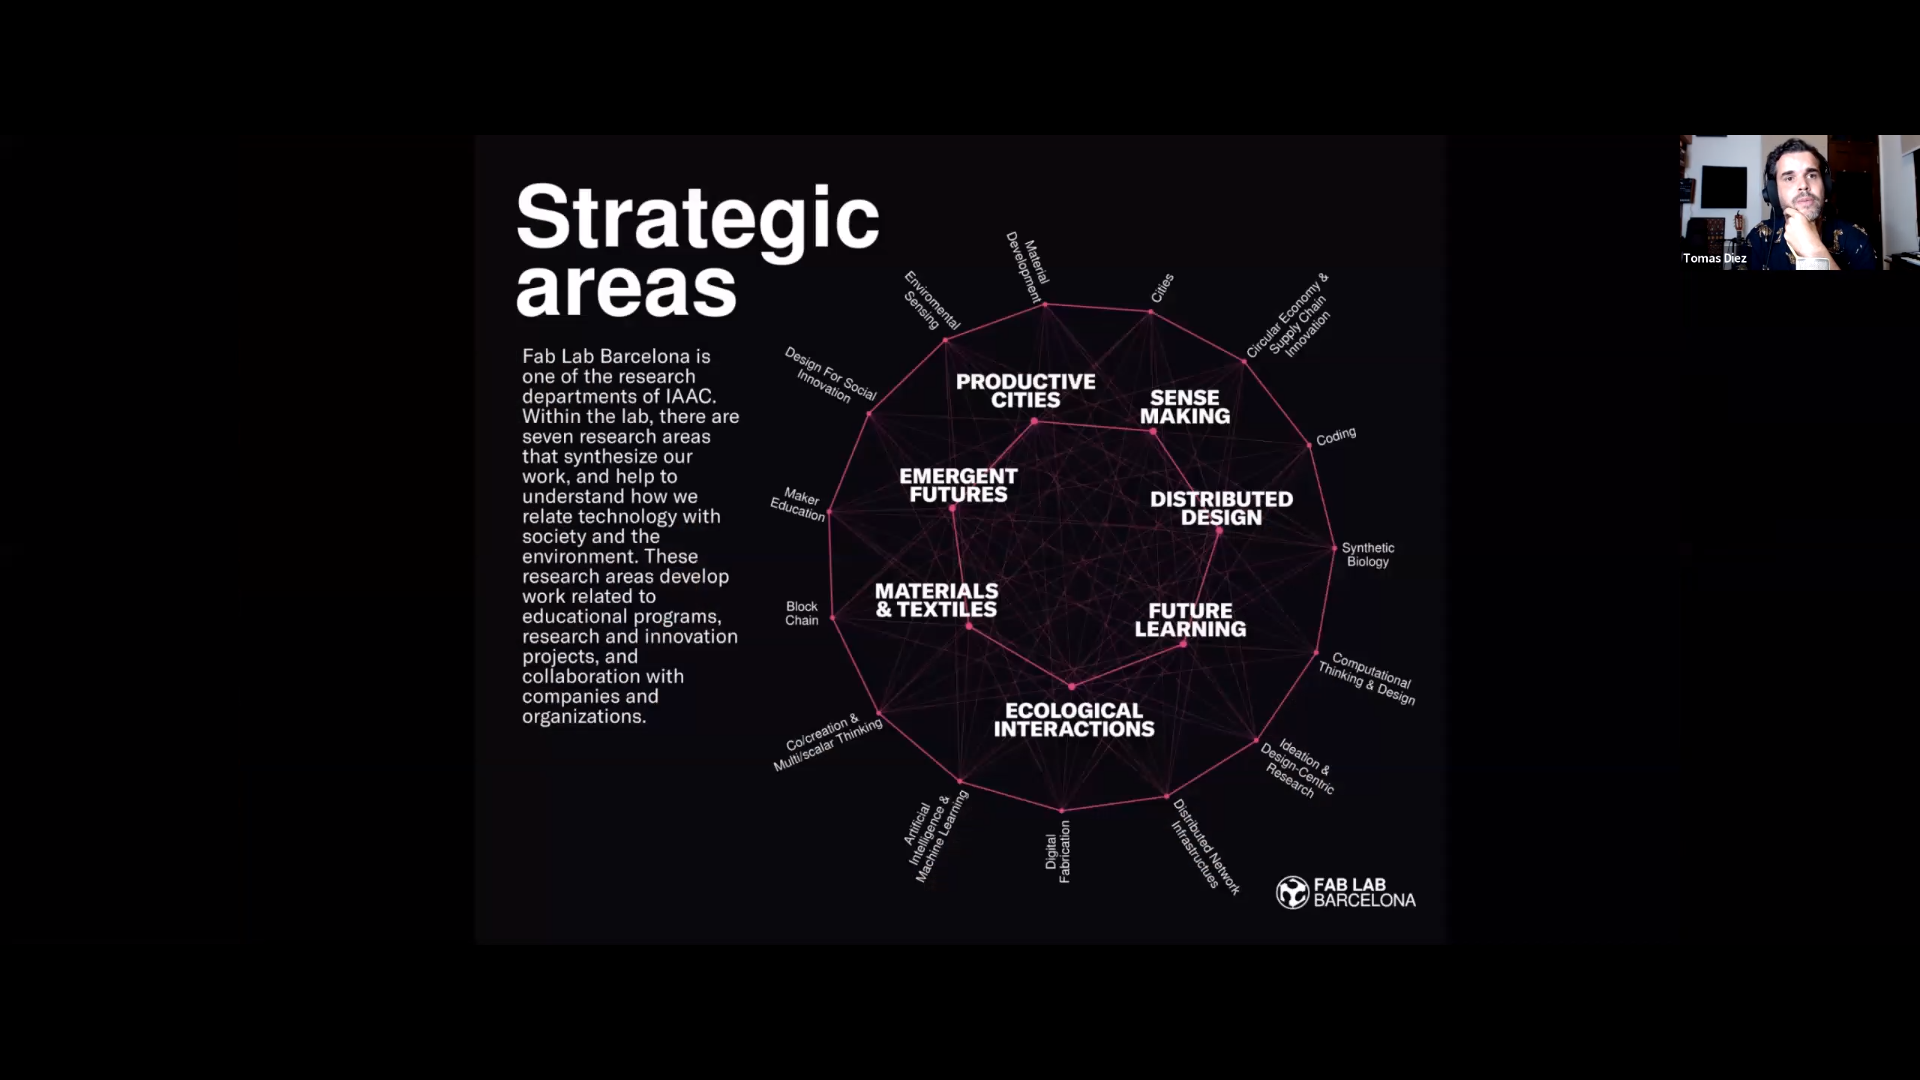 FabLabBarcelona-StrategicAreas